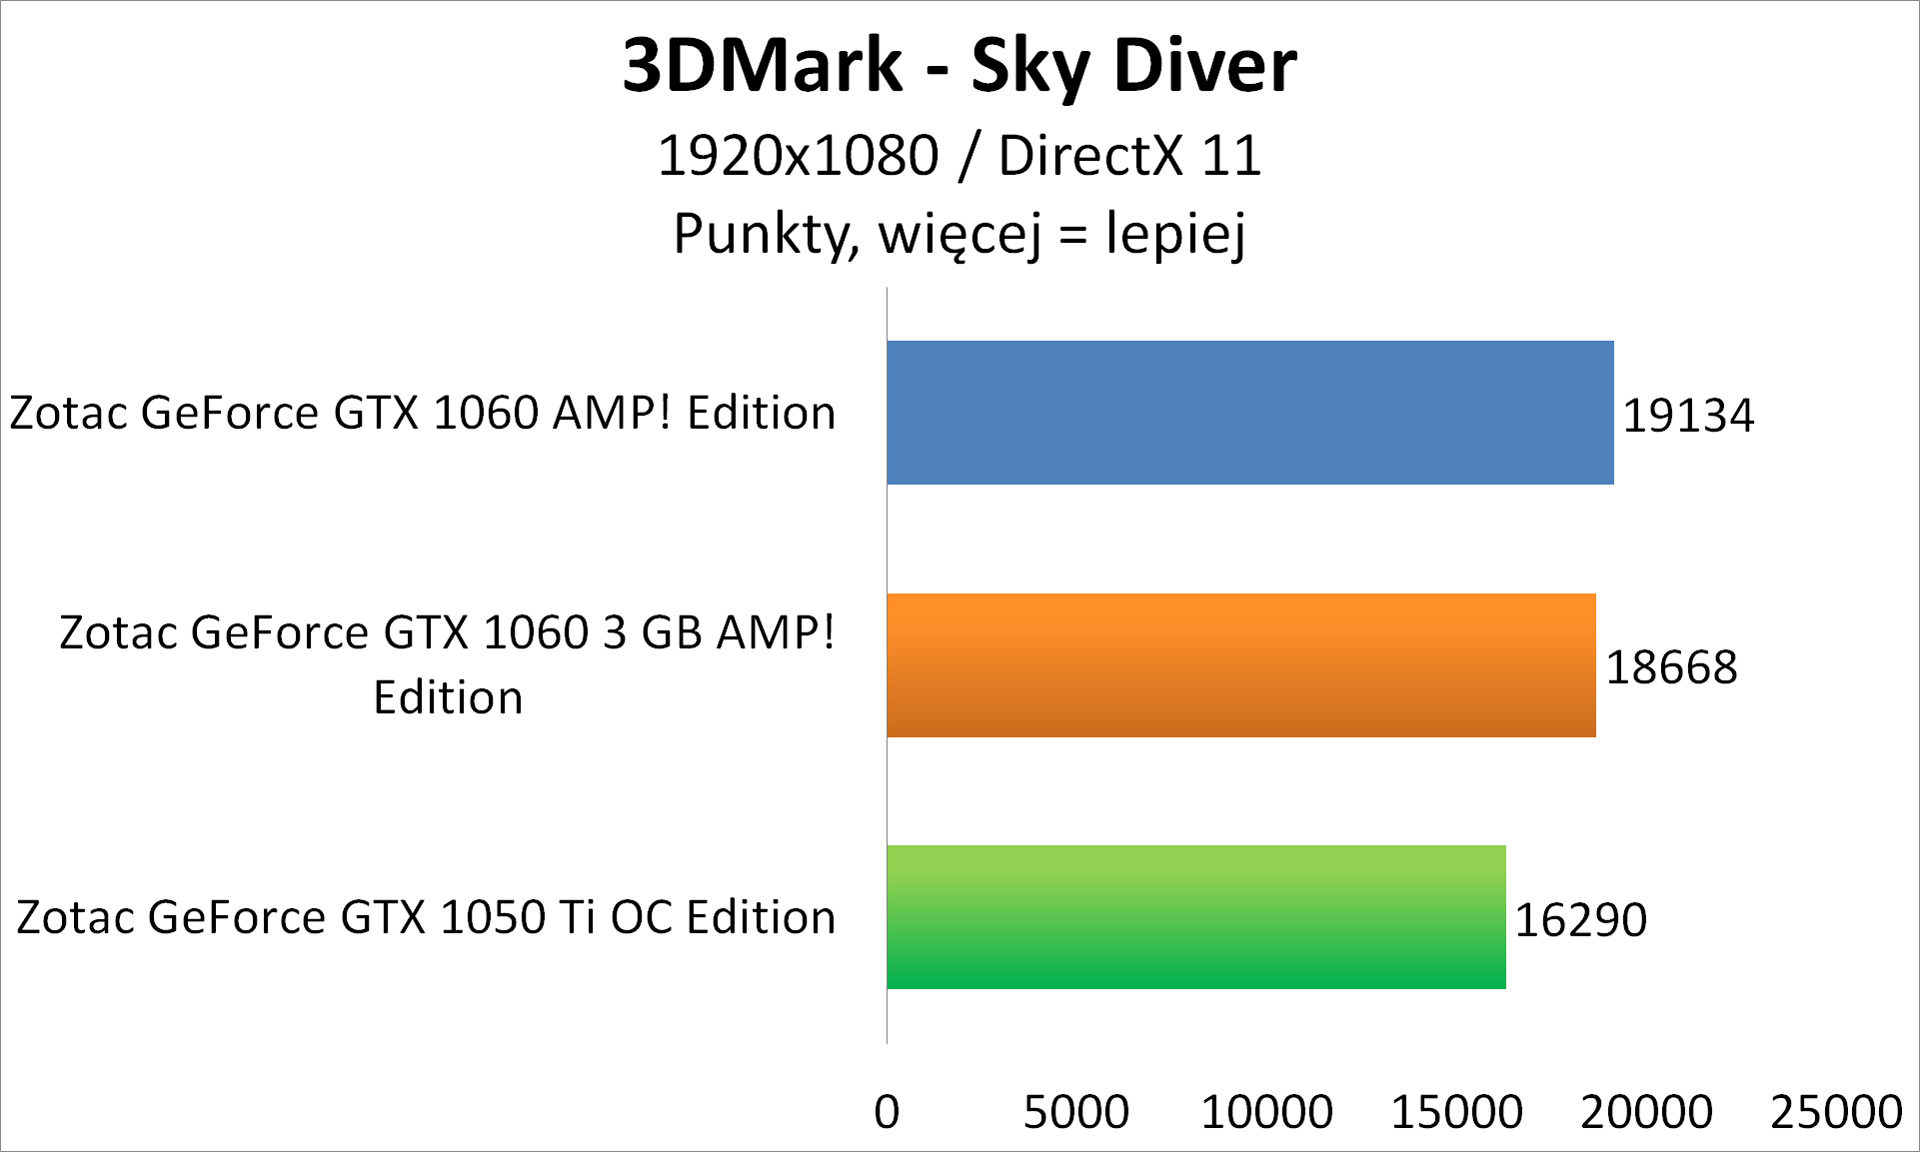 Zotac GeForce GTX 1050 Ti OC Edition - 3DMark - Sky Diver